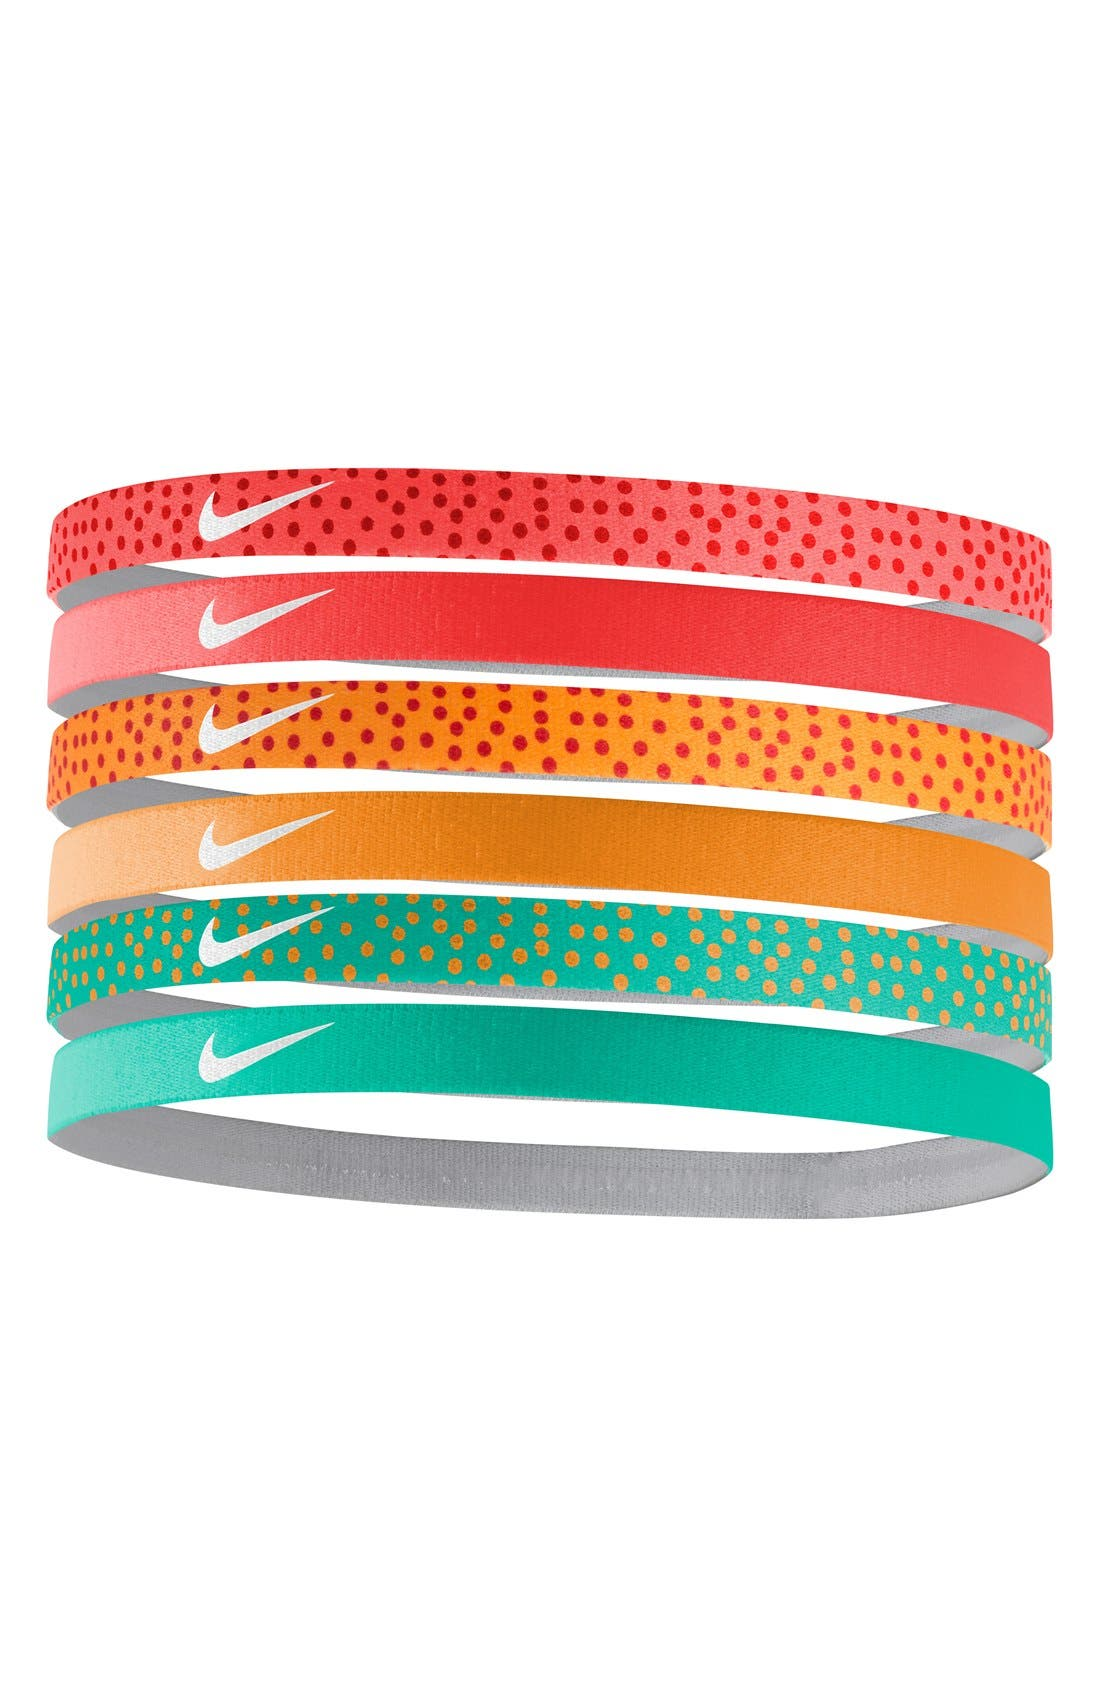 Main Image - Nike Sport Headbands (6-Pack)